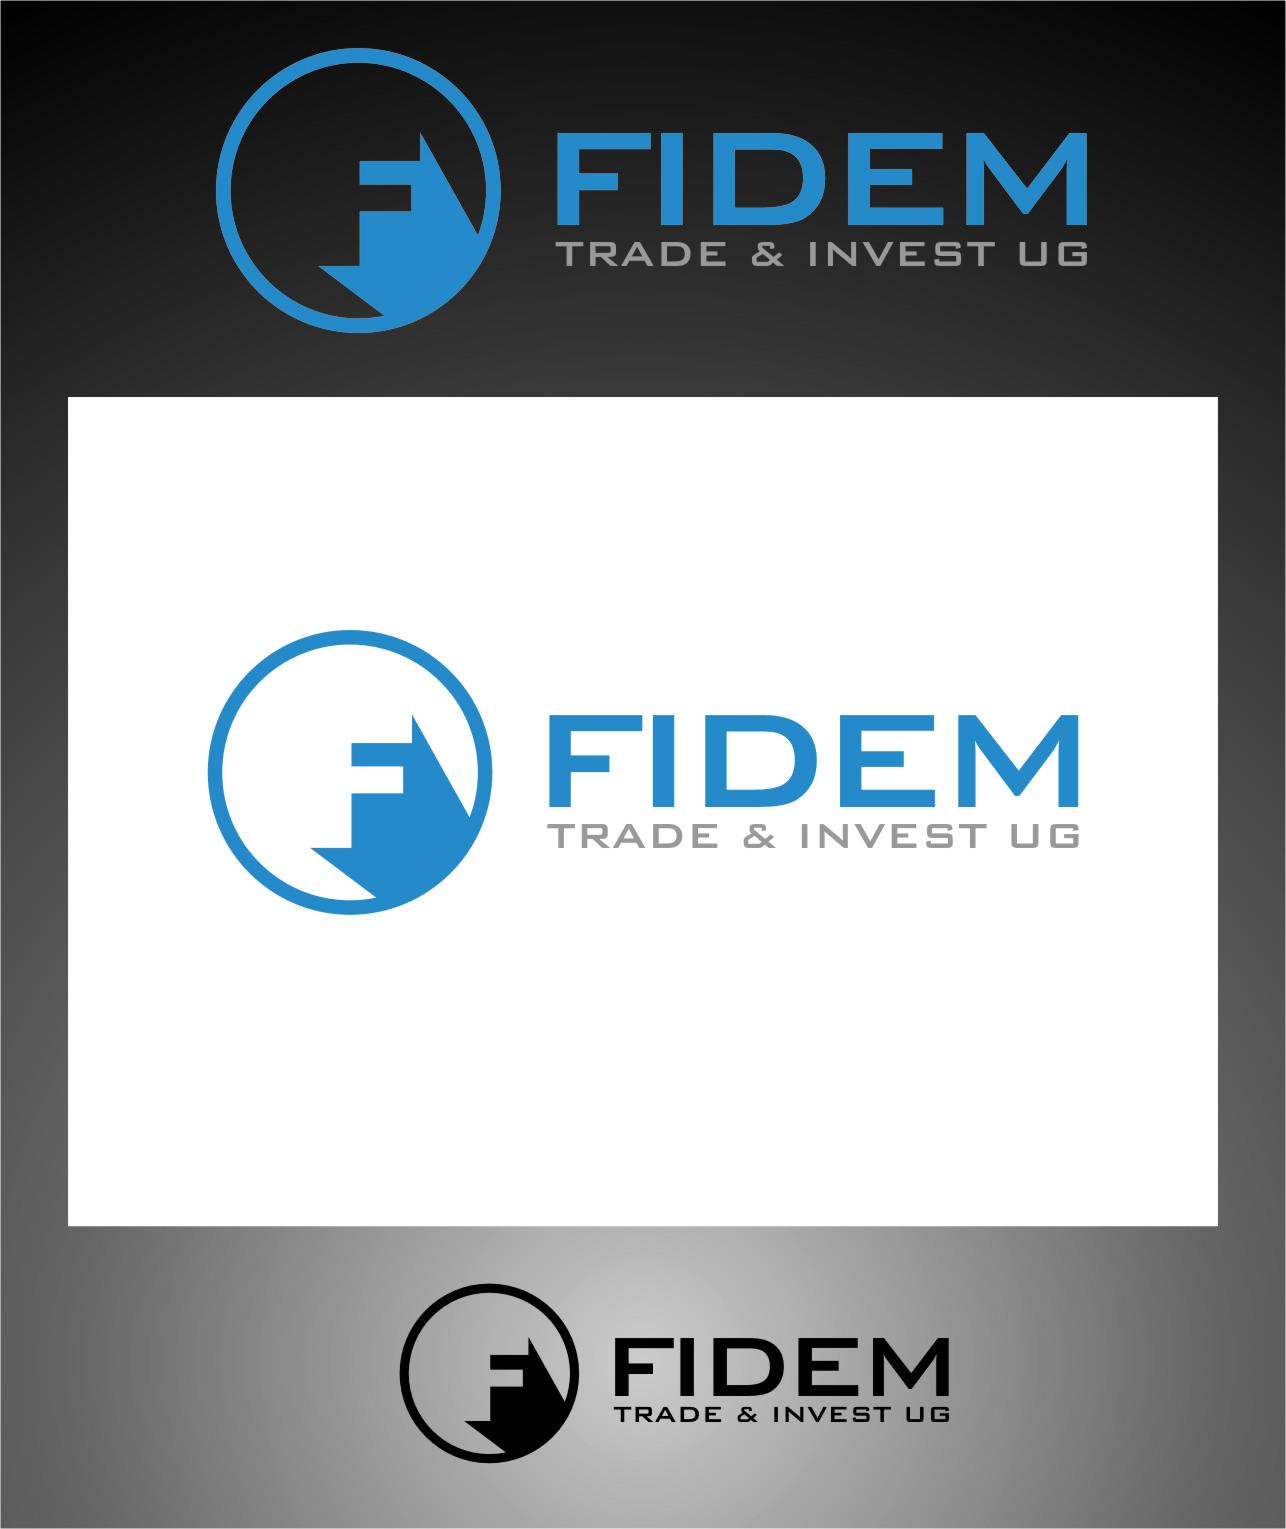 Logo Design by Ngepet_art - Entry No. 337 in the Logo Design Contest Professional Logo Design for FIDEM Trade & Invest UG.